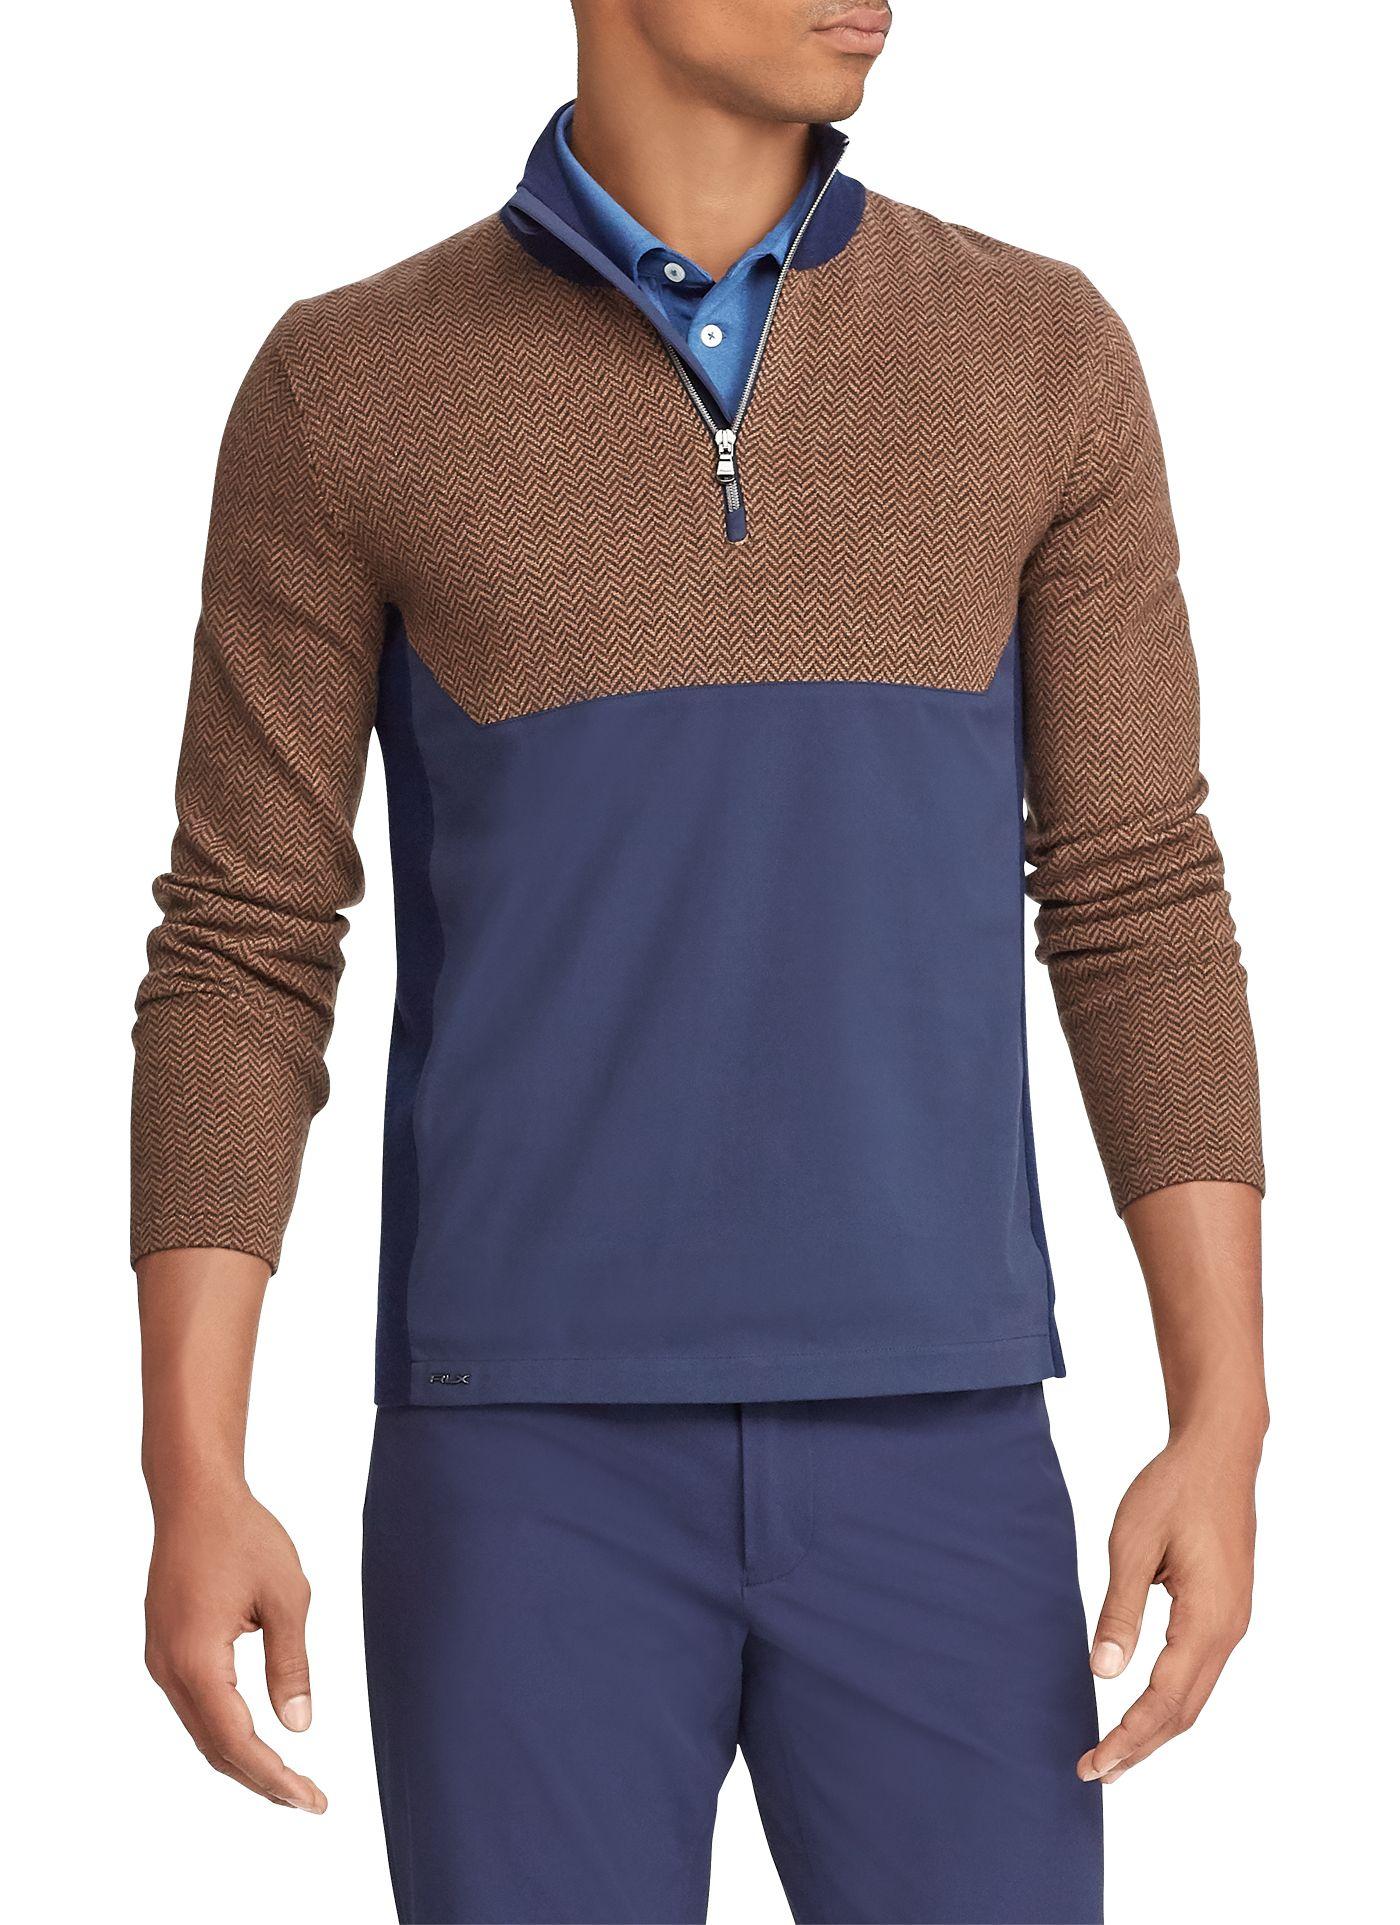 RLX Golf Men's Hybrid Sweater ¼ Zip Golf Pullover